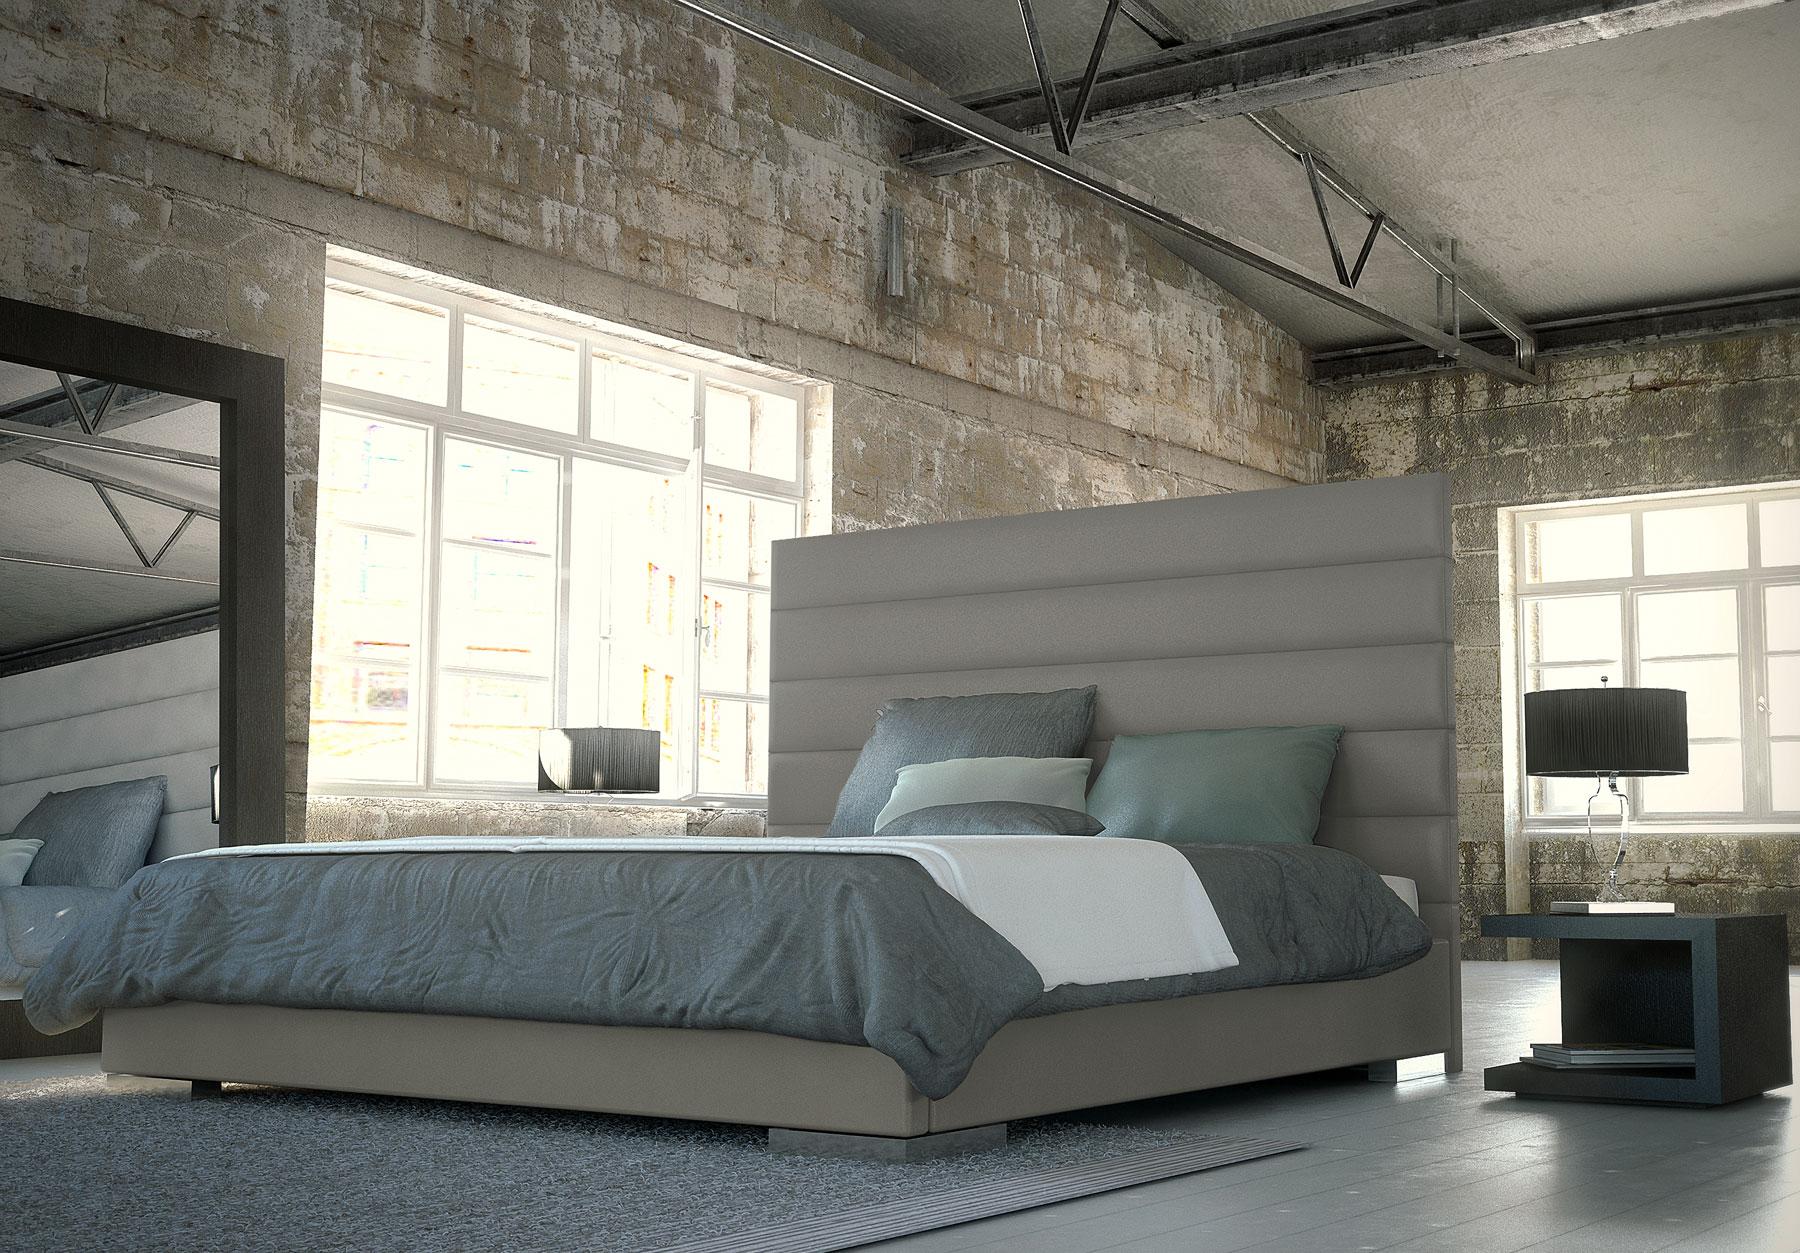 Ludlow Bed King   Modloft   Modloft Bookcase